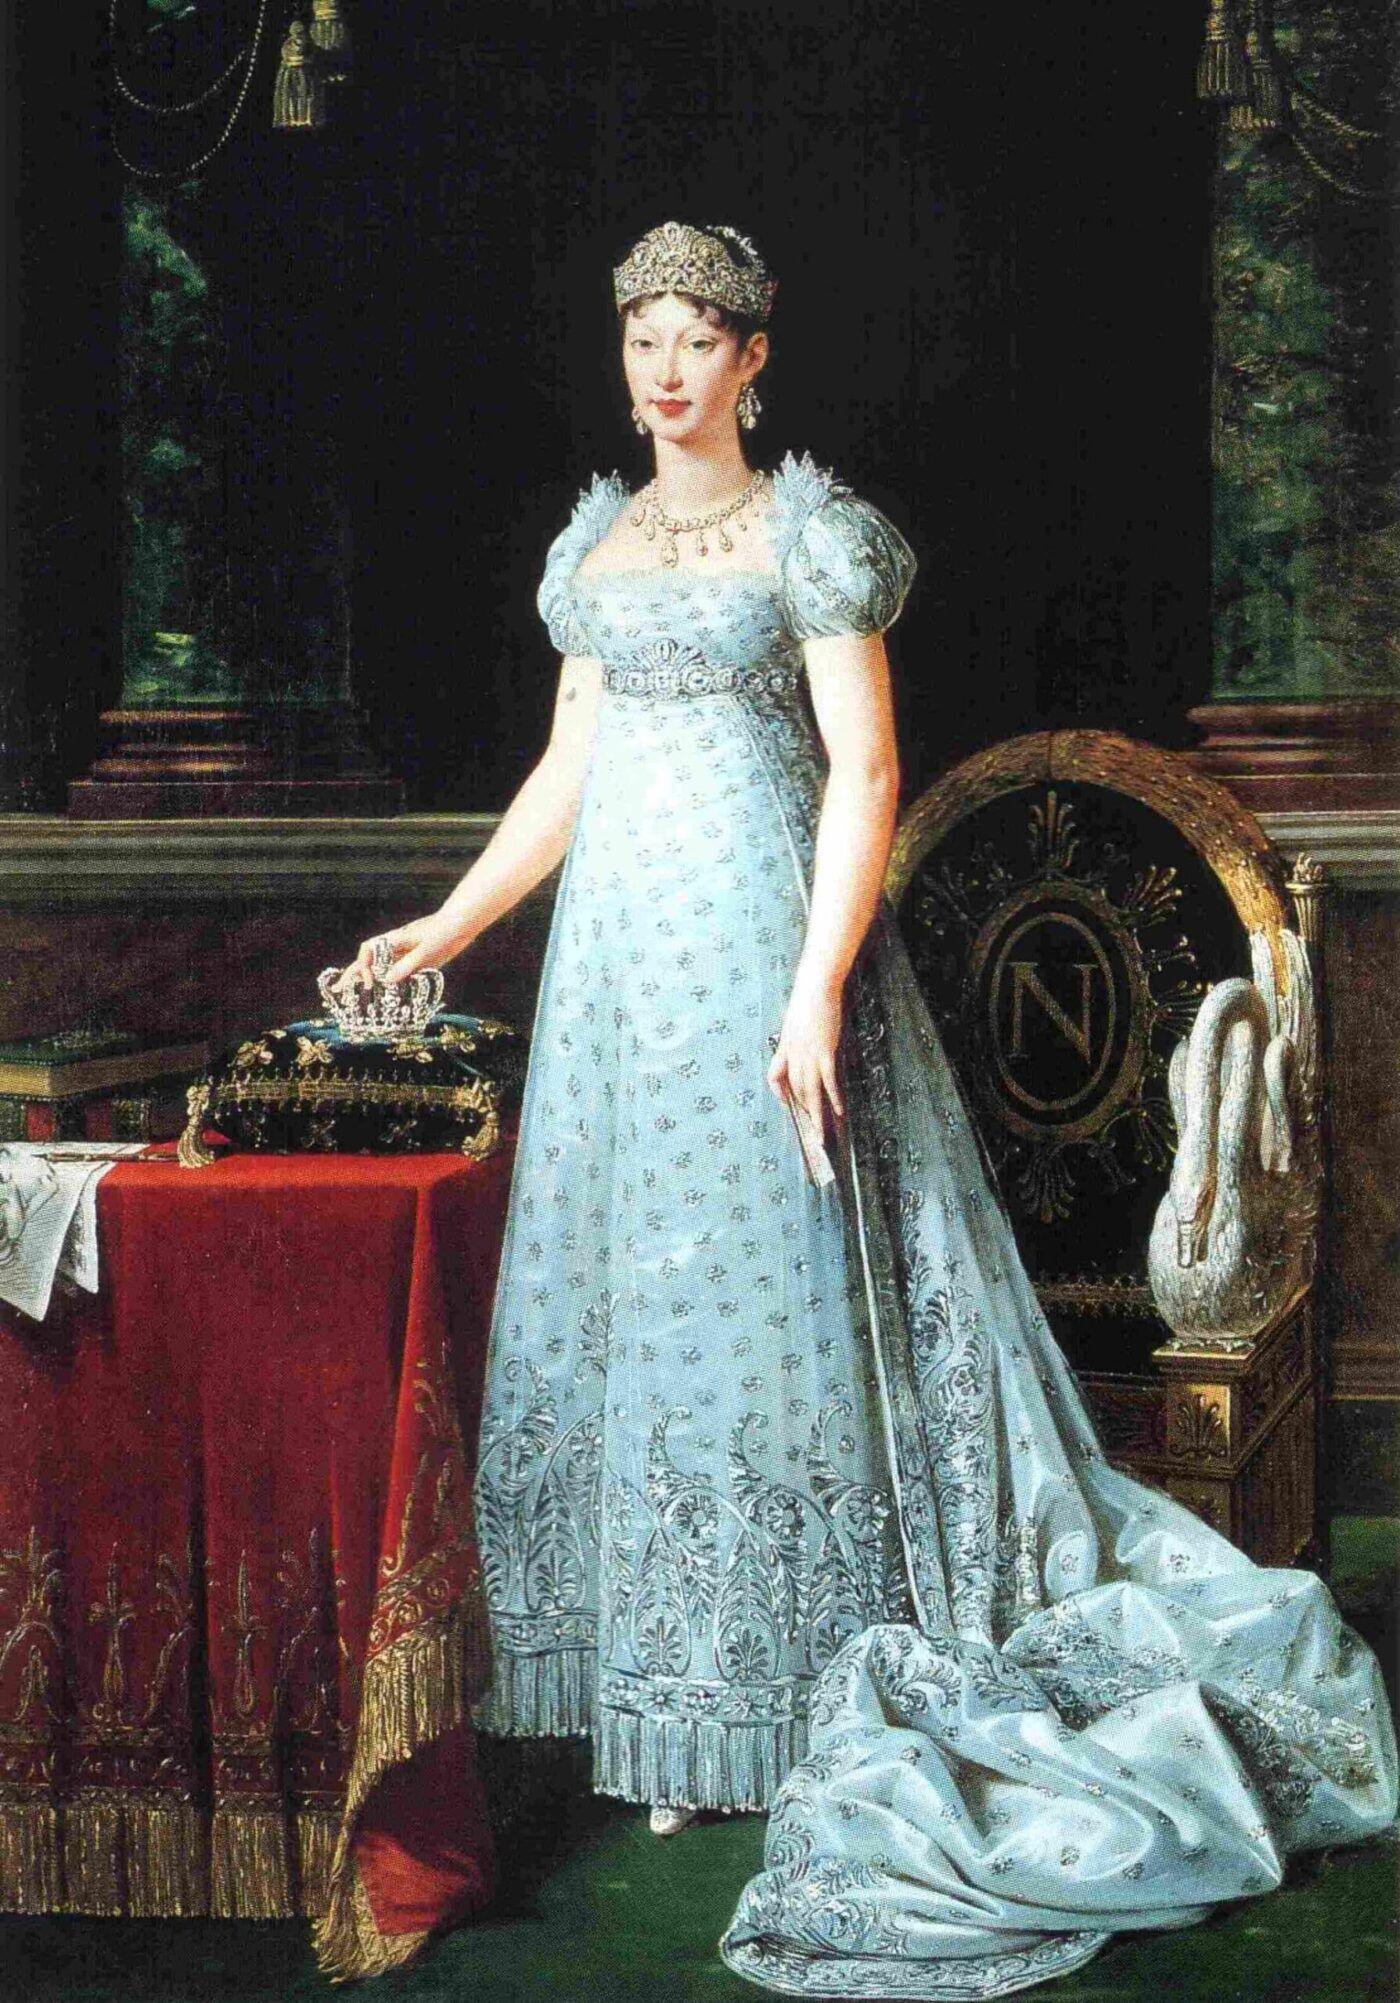 keizerin Marie-Louise met Chaumet sieraden Blog Zilver.nl